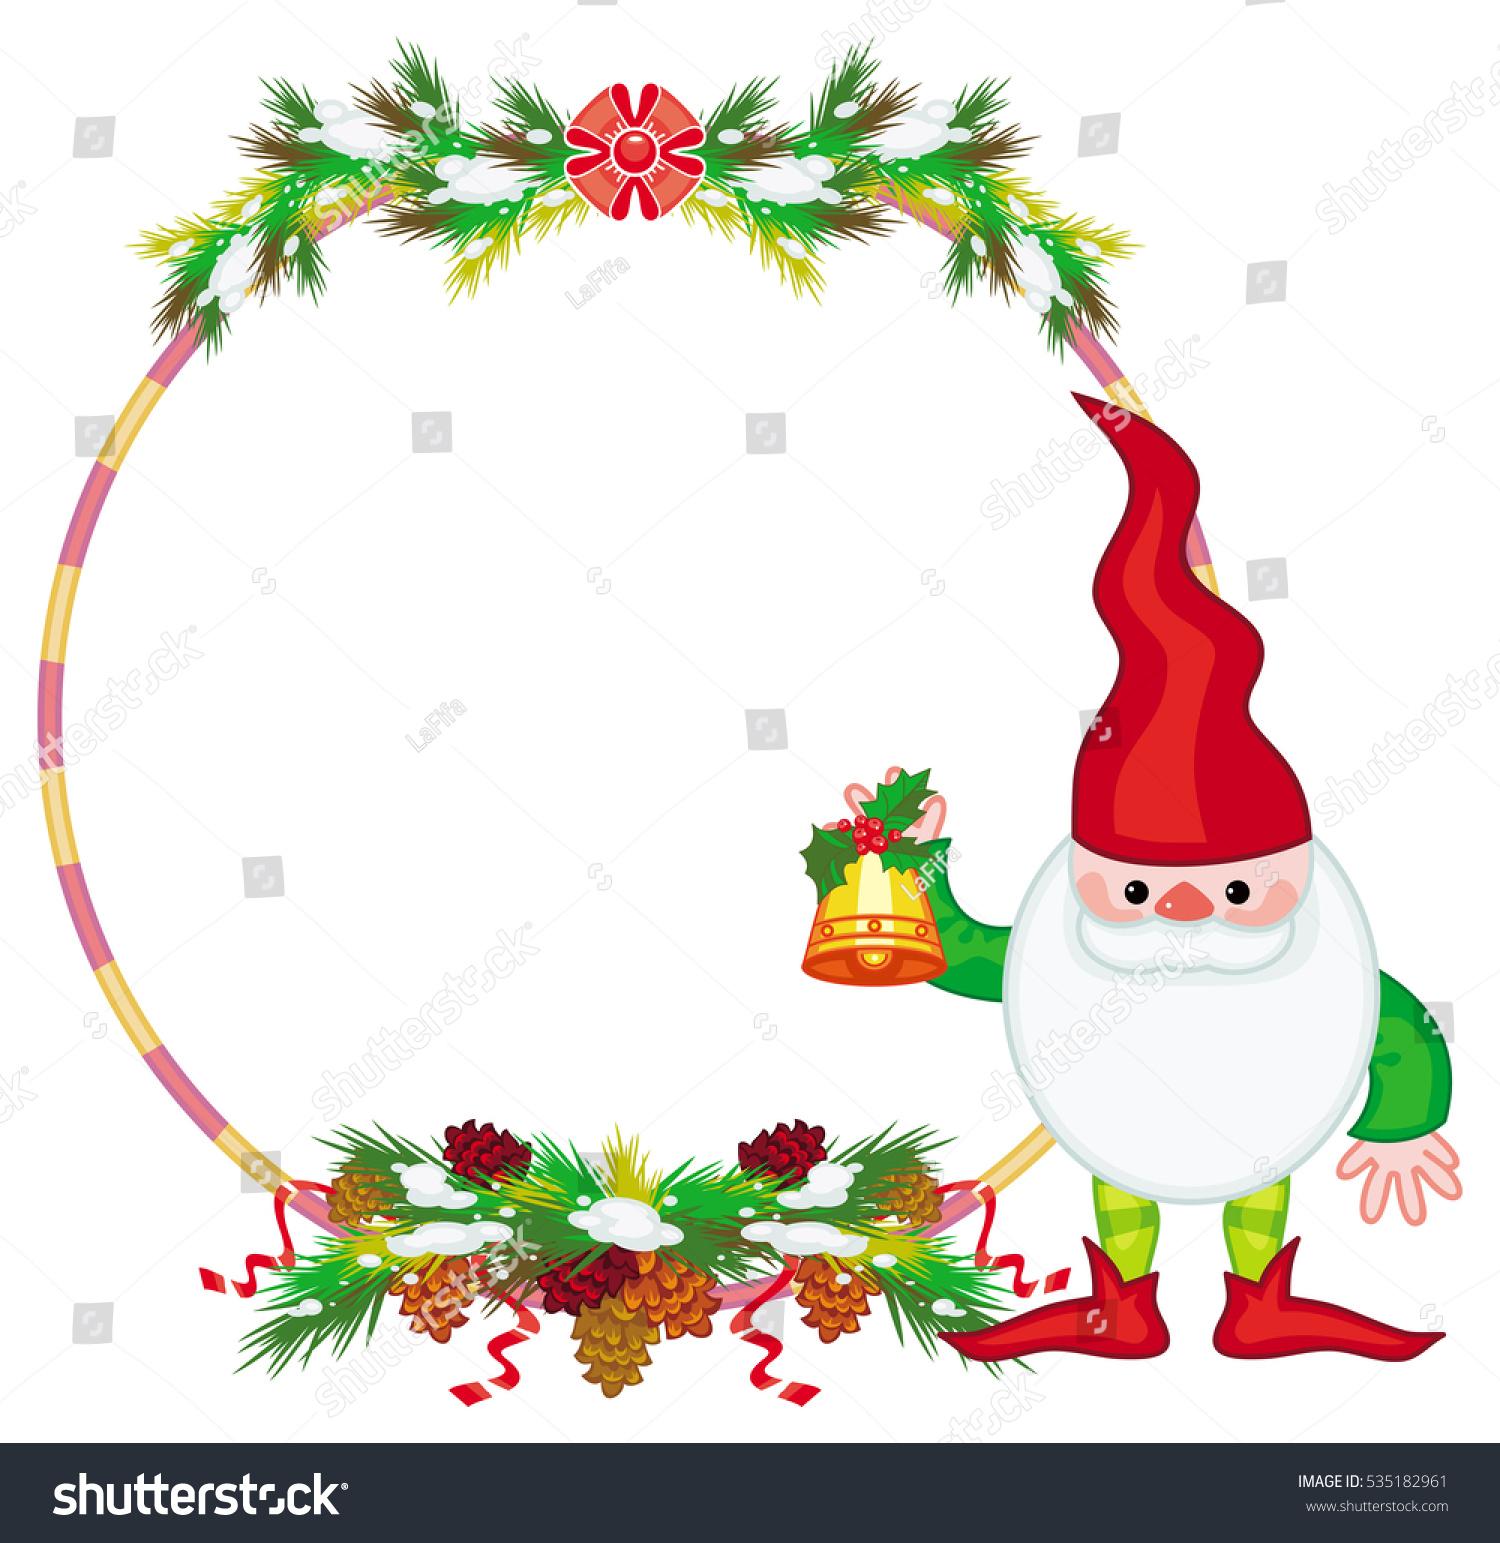 holiday frame decorations christmas elf copy stock illustration rh shutterstock com